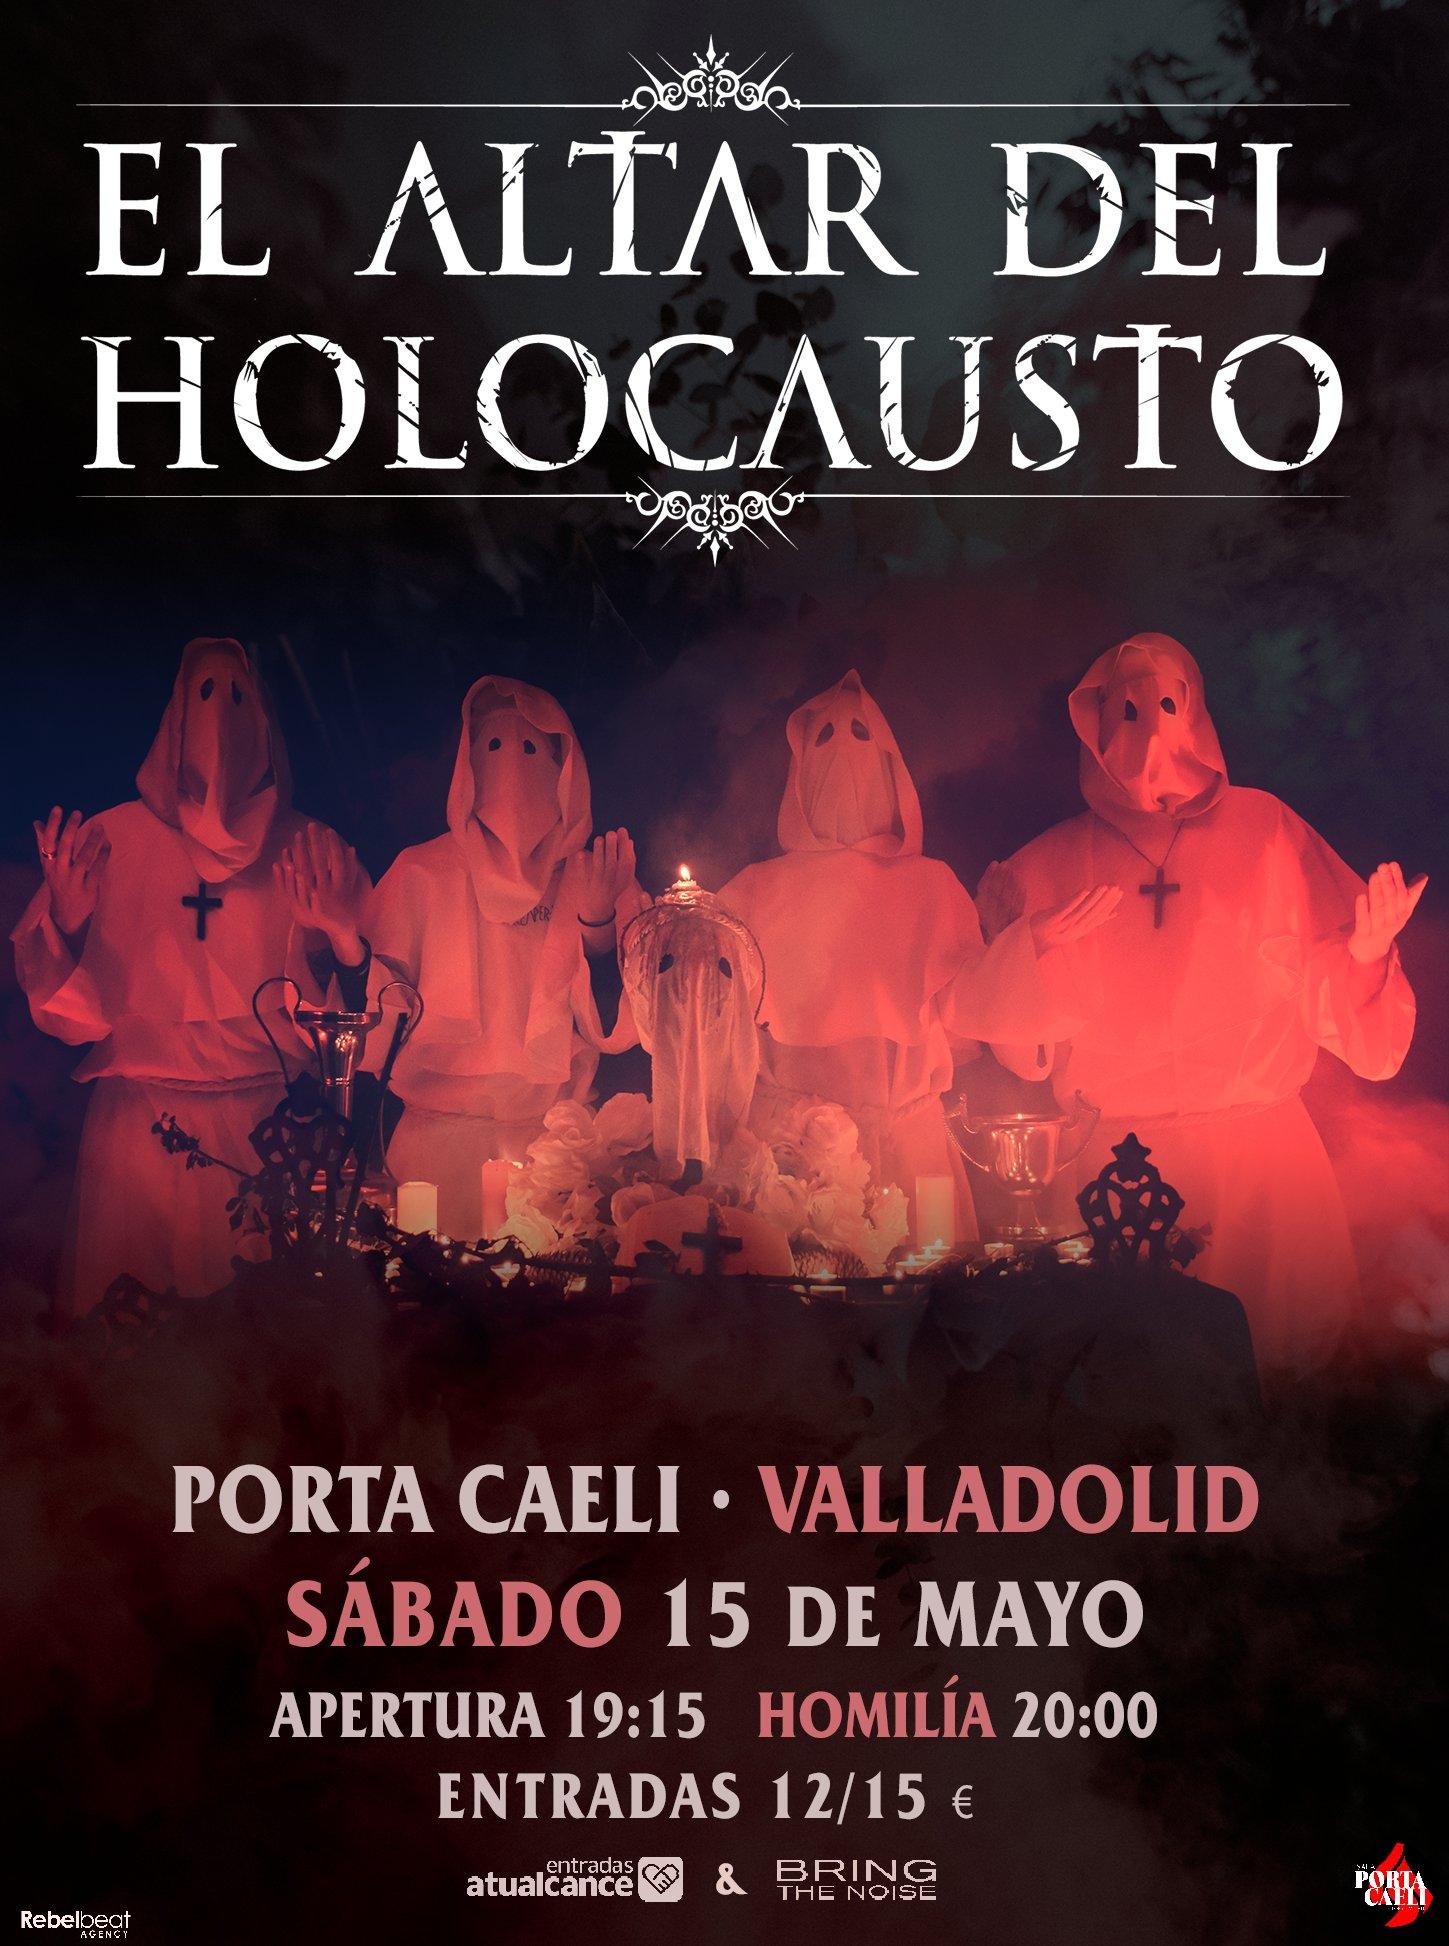 El Altar Del Holocausto: ¡¡¡✞ T R I N I DAD - Nuevo album disponible✞ !!!!! - Página 16 EyTJLTOWUAI0g5z?format=jpg&name=large